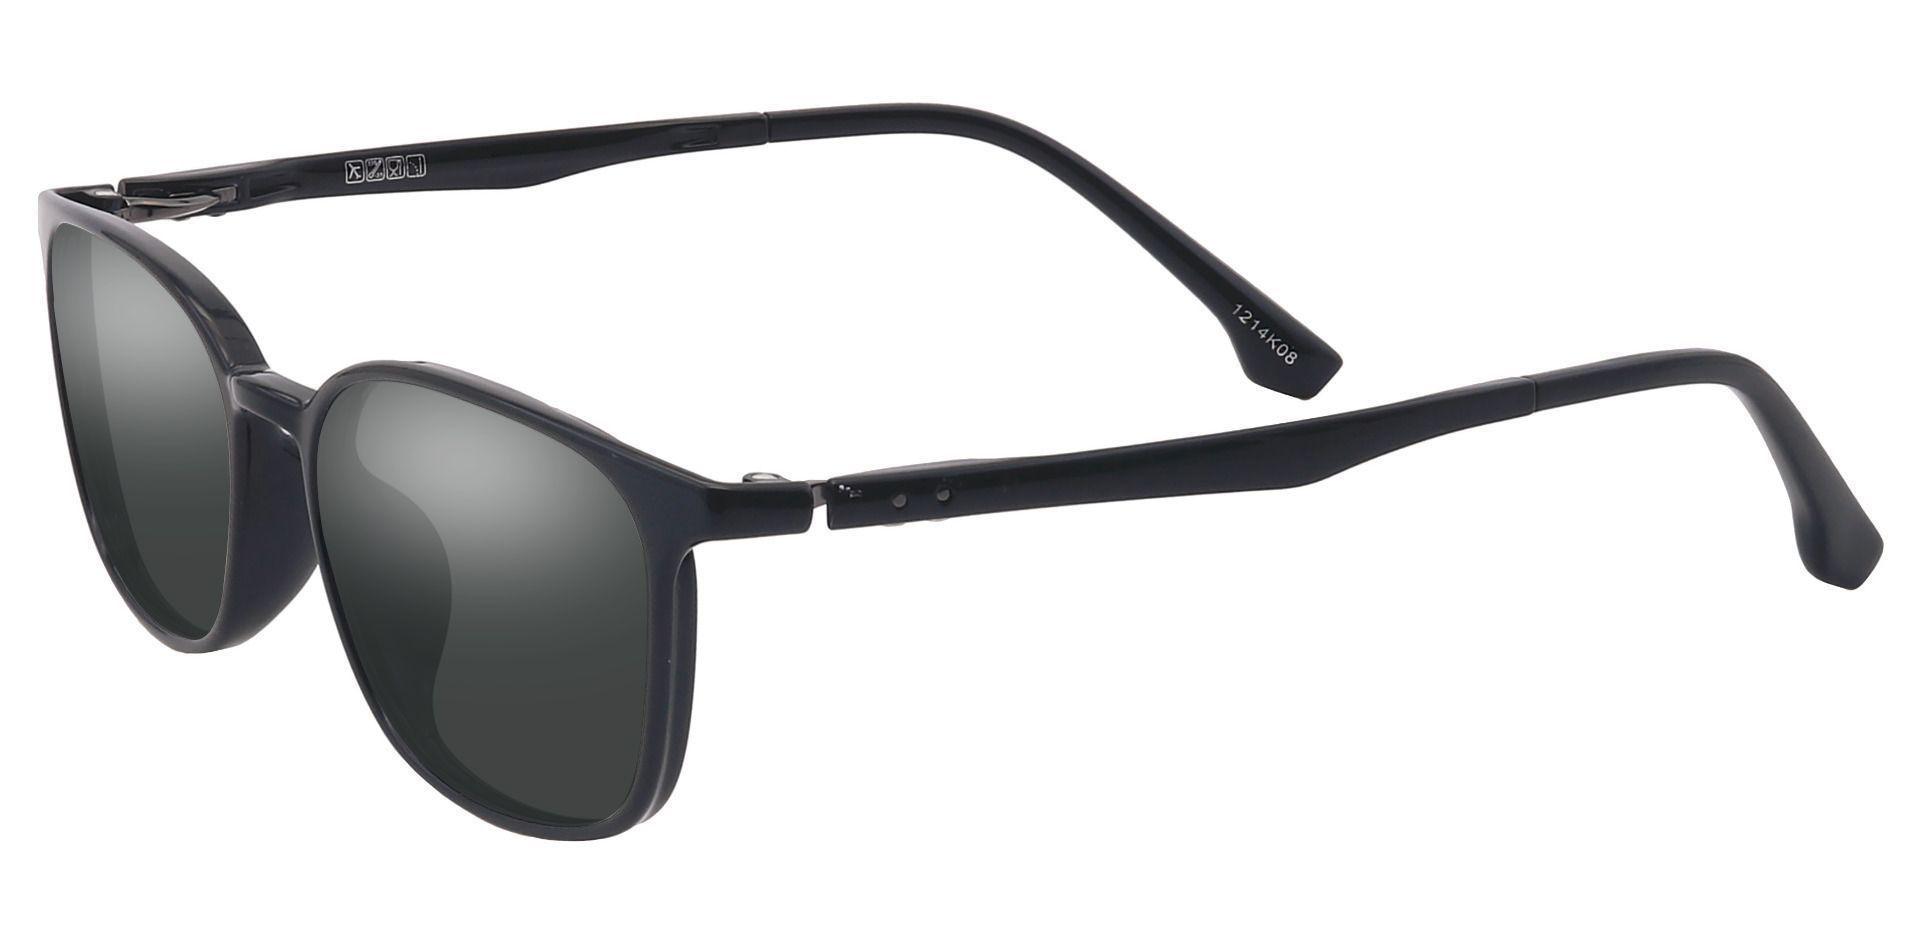 Plateau Oval Prescription Sunglasses - Black Frame With Gray Lenses